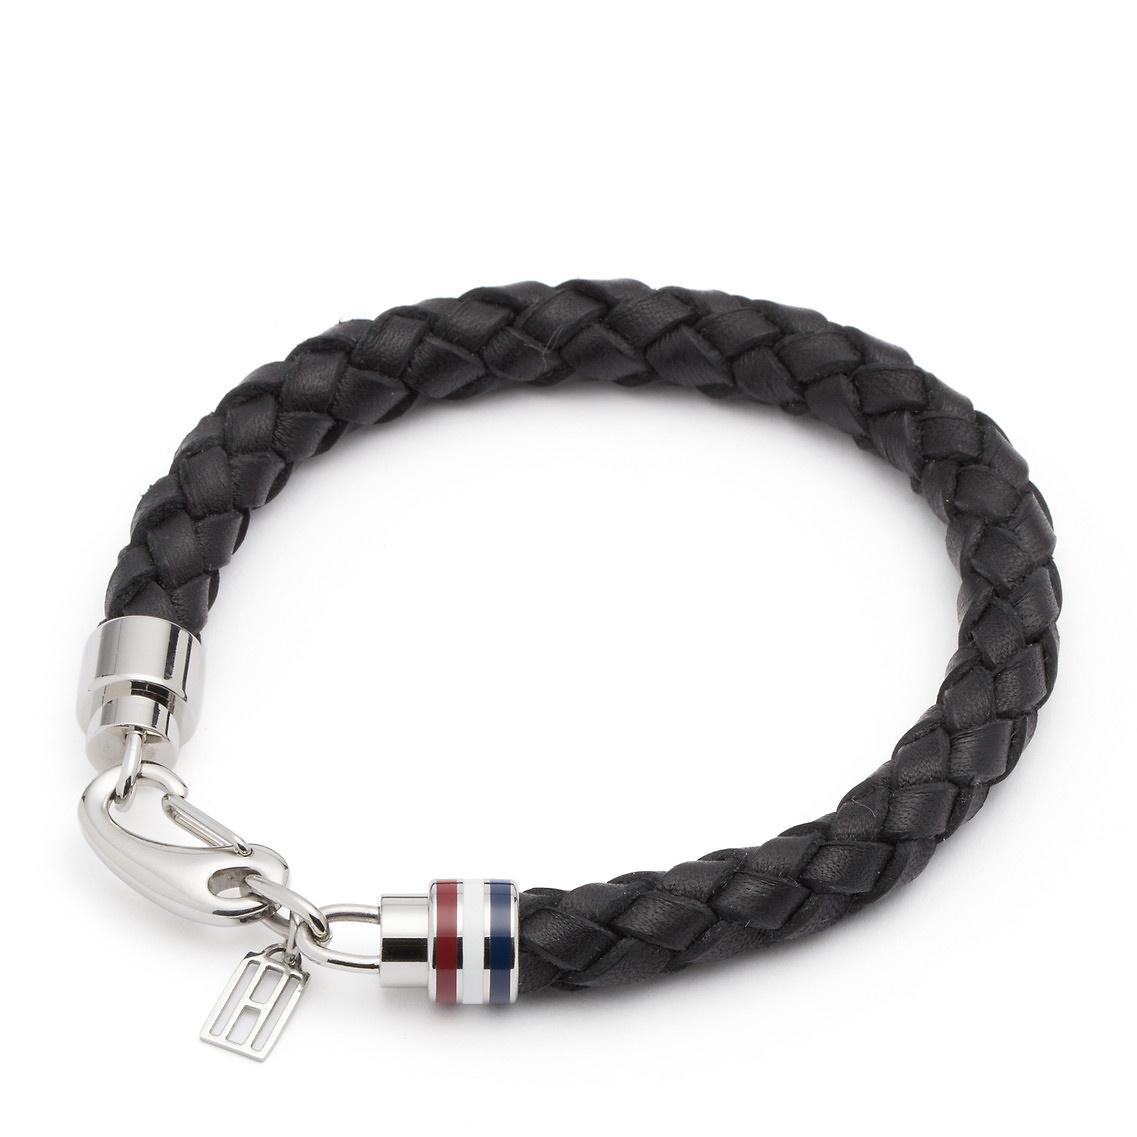 ba6fce152aaee Tommy Hilfiger Black Leather & Chain Bracelet for men